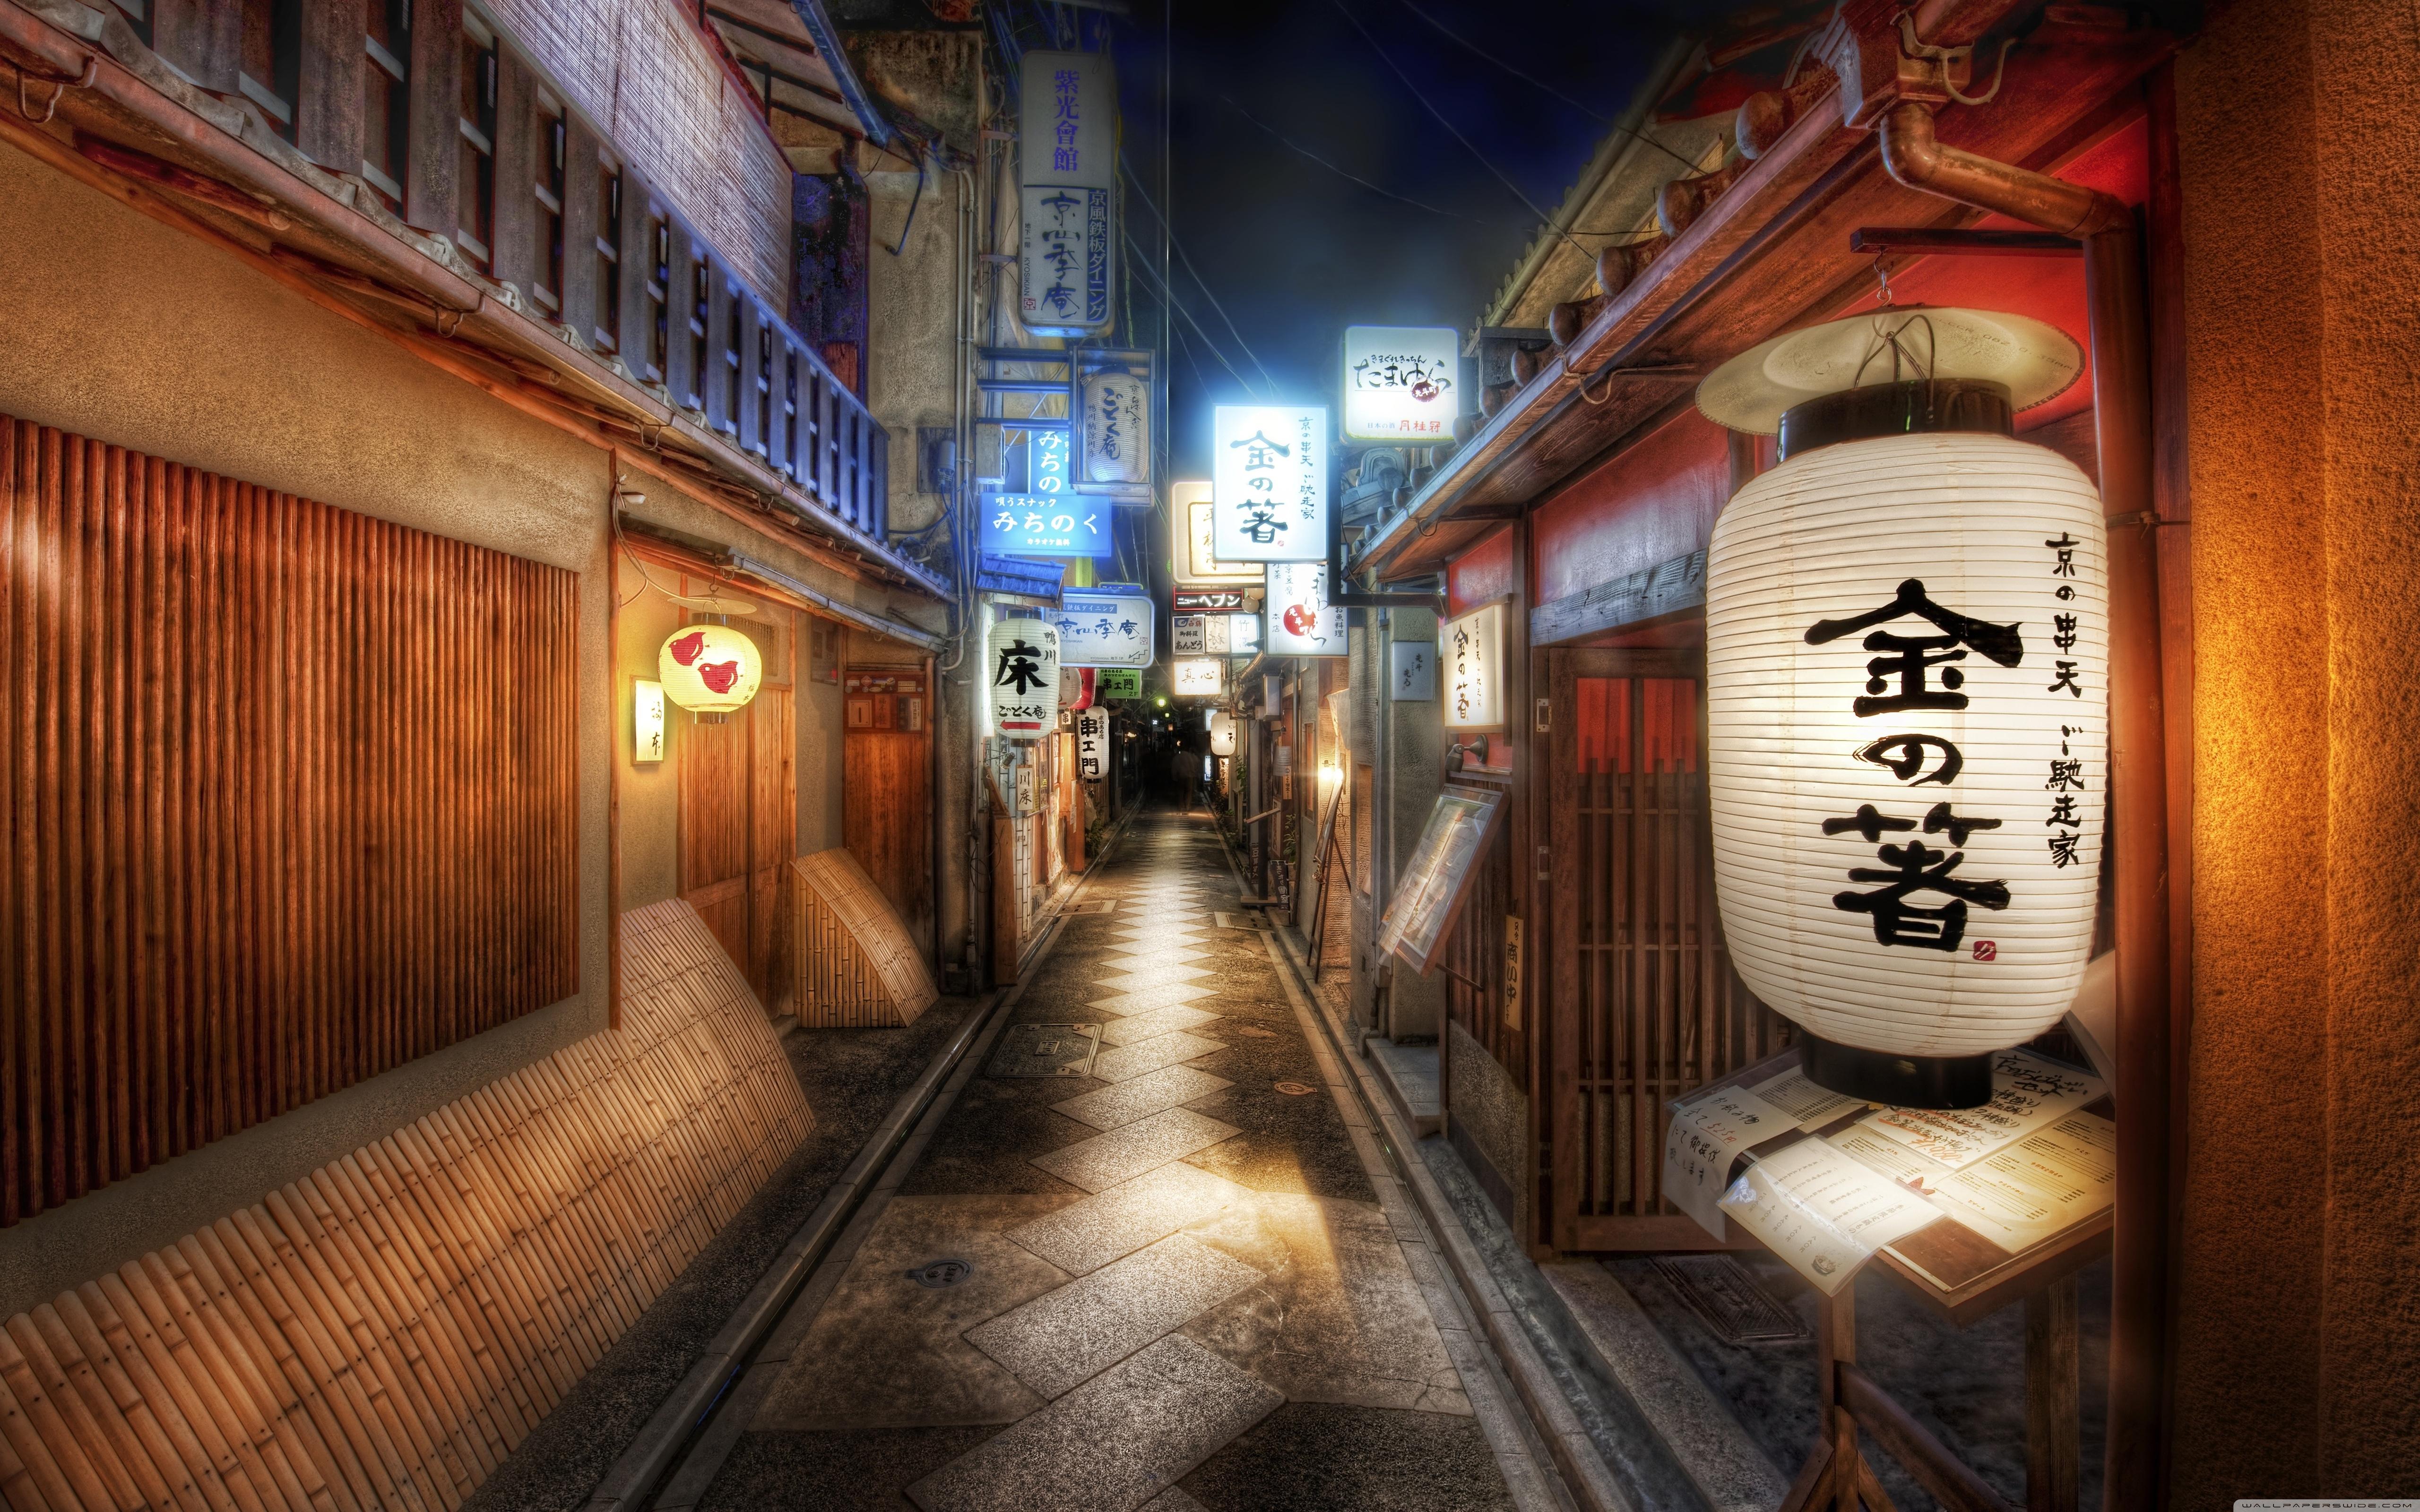 kyoto, japan ❤ 4k hd desktop wallpaper for 4k ultra hd tv • tablet